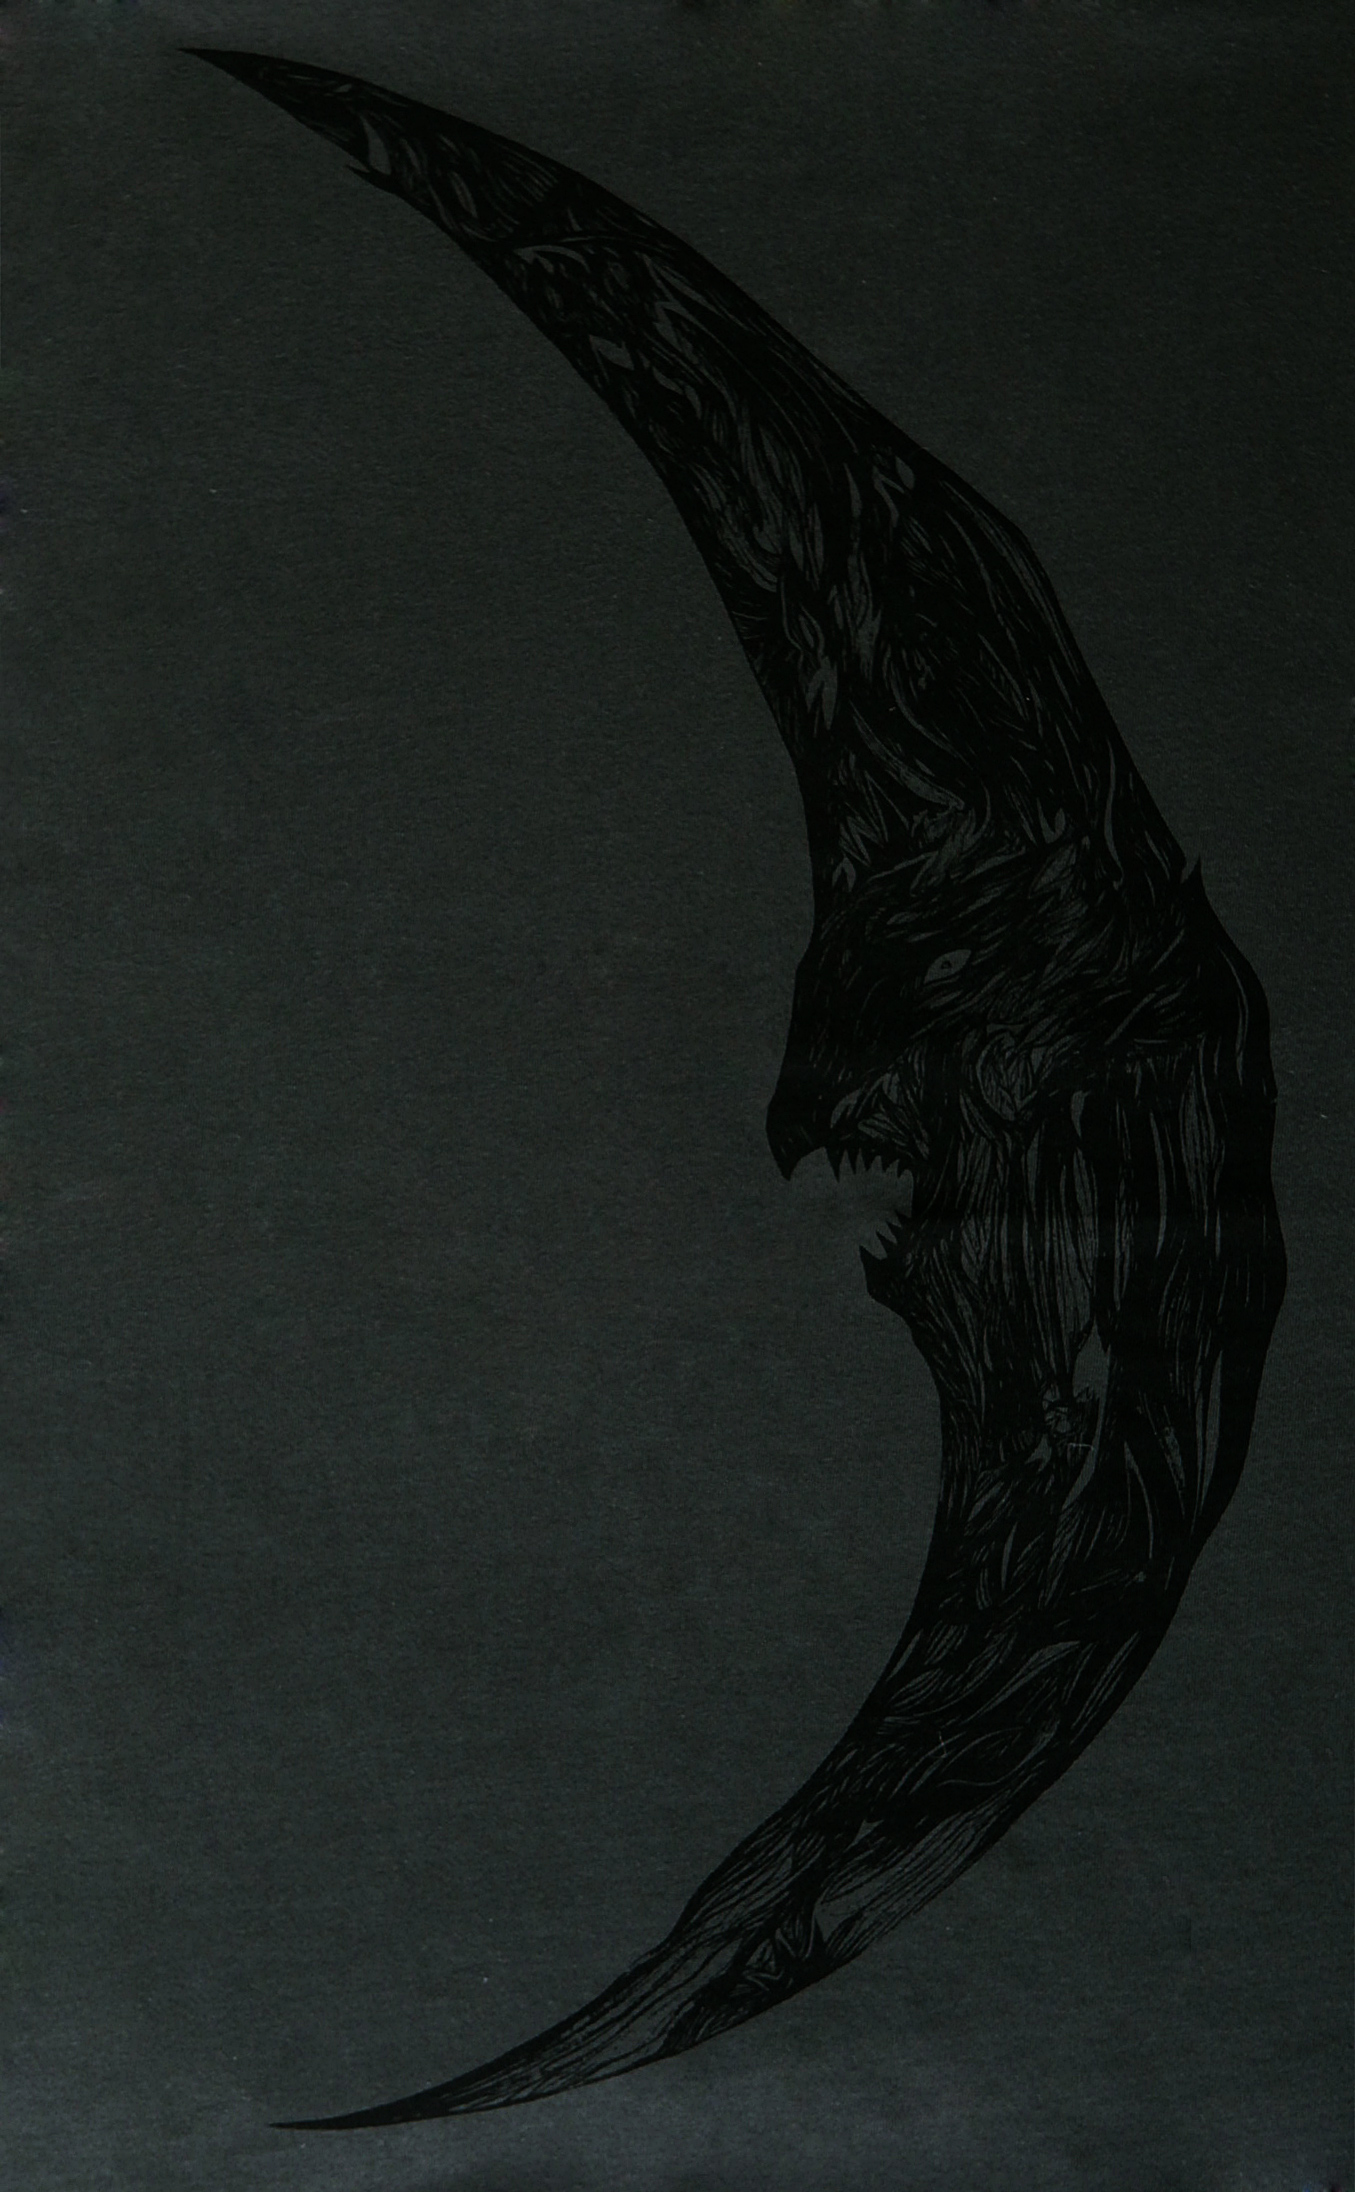 crescent_moon_men_shirt_charcoal_brandnew_design_t_shirts_3.jpg